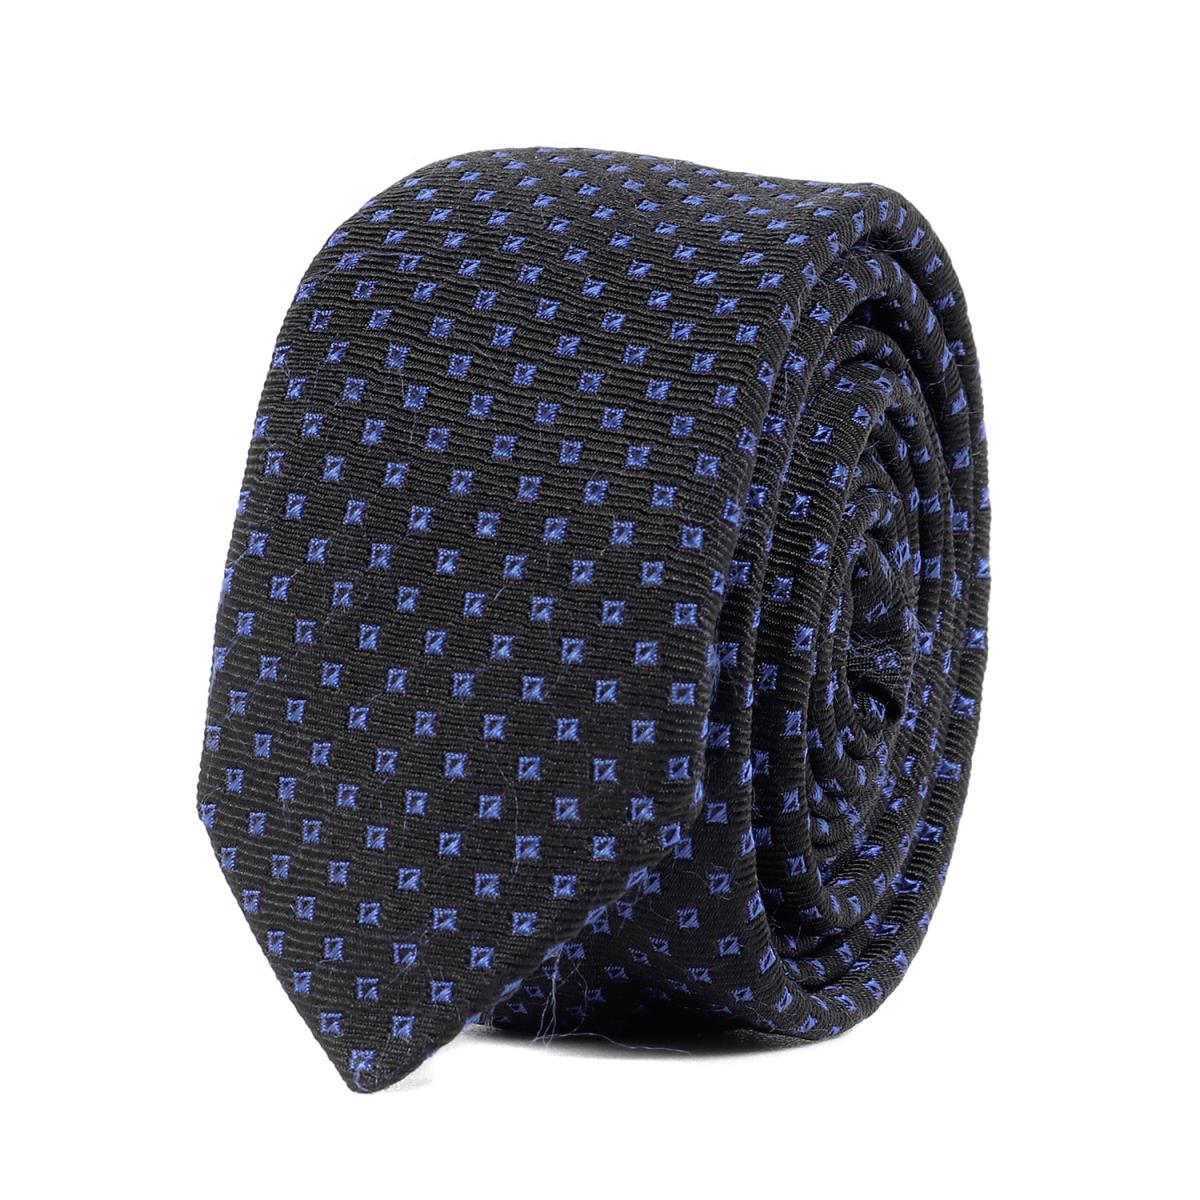 Dior HOMME (ディオールオム) スクエアドットシルクナローネクタイ イタリア製 シルク100% ブラック×ブルー 【メンズ】【中古】【美品】【K2394】【あす楽☆対応可】